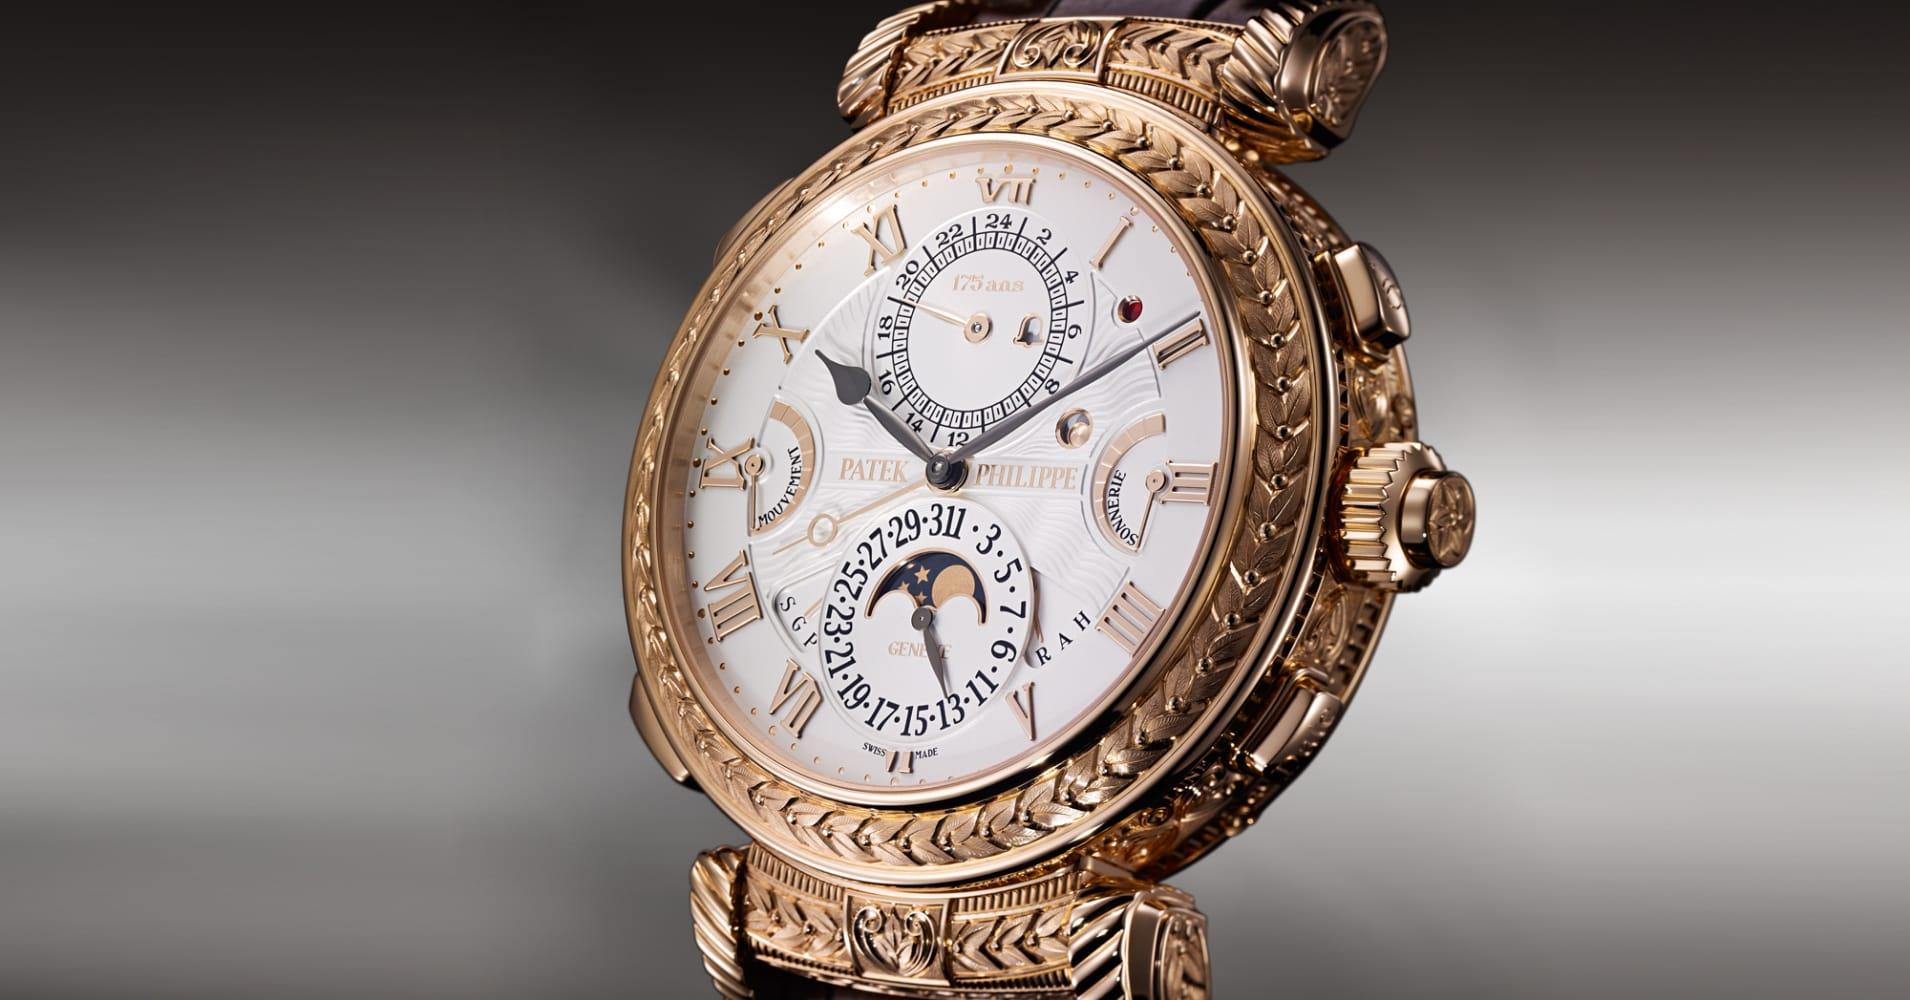 Patek philippe unveils 2 6m watch for Patek watches